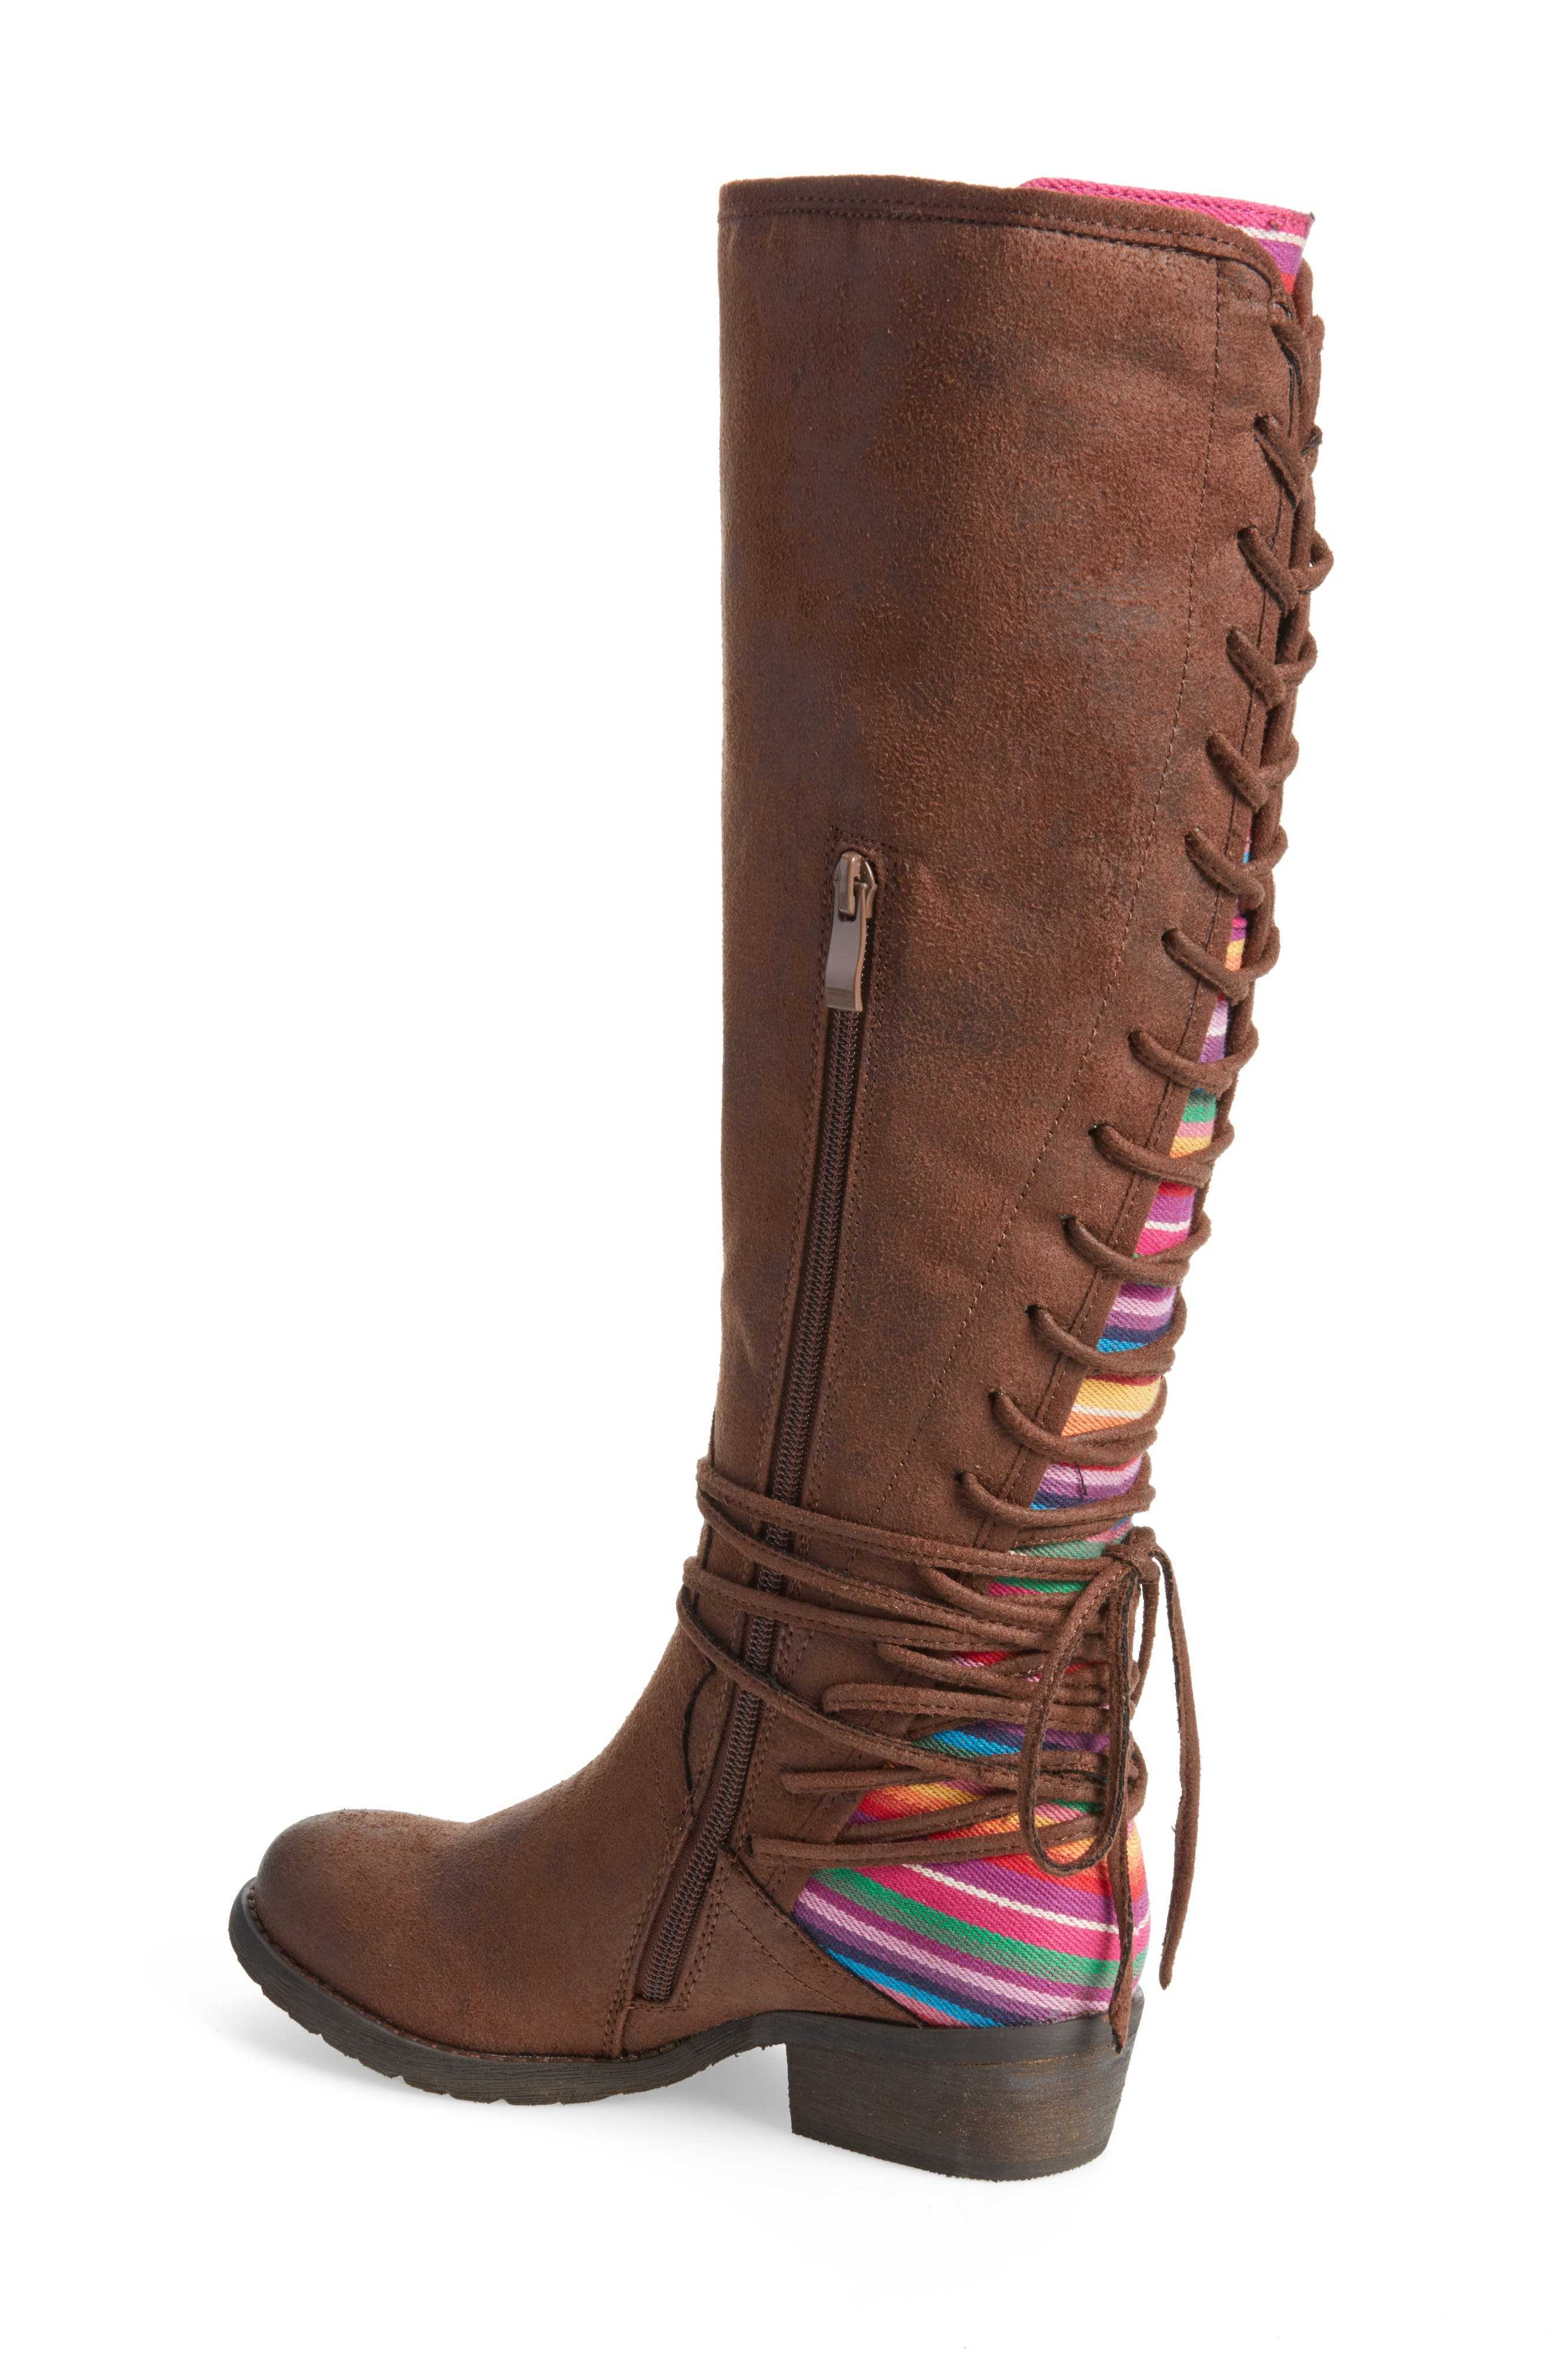 Marcel Corseted Knee High Boot,                             Alternate thumbnail 2, color,                             Serape